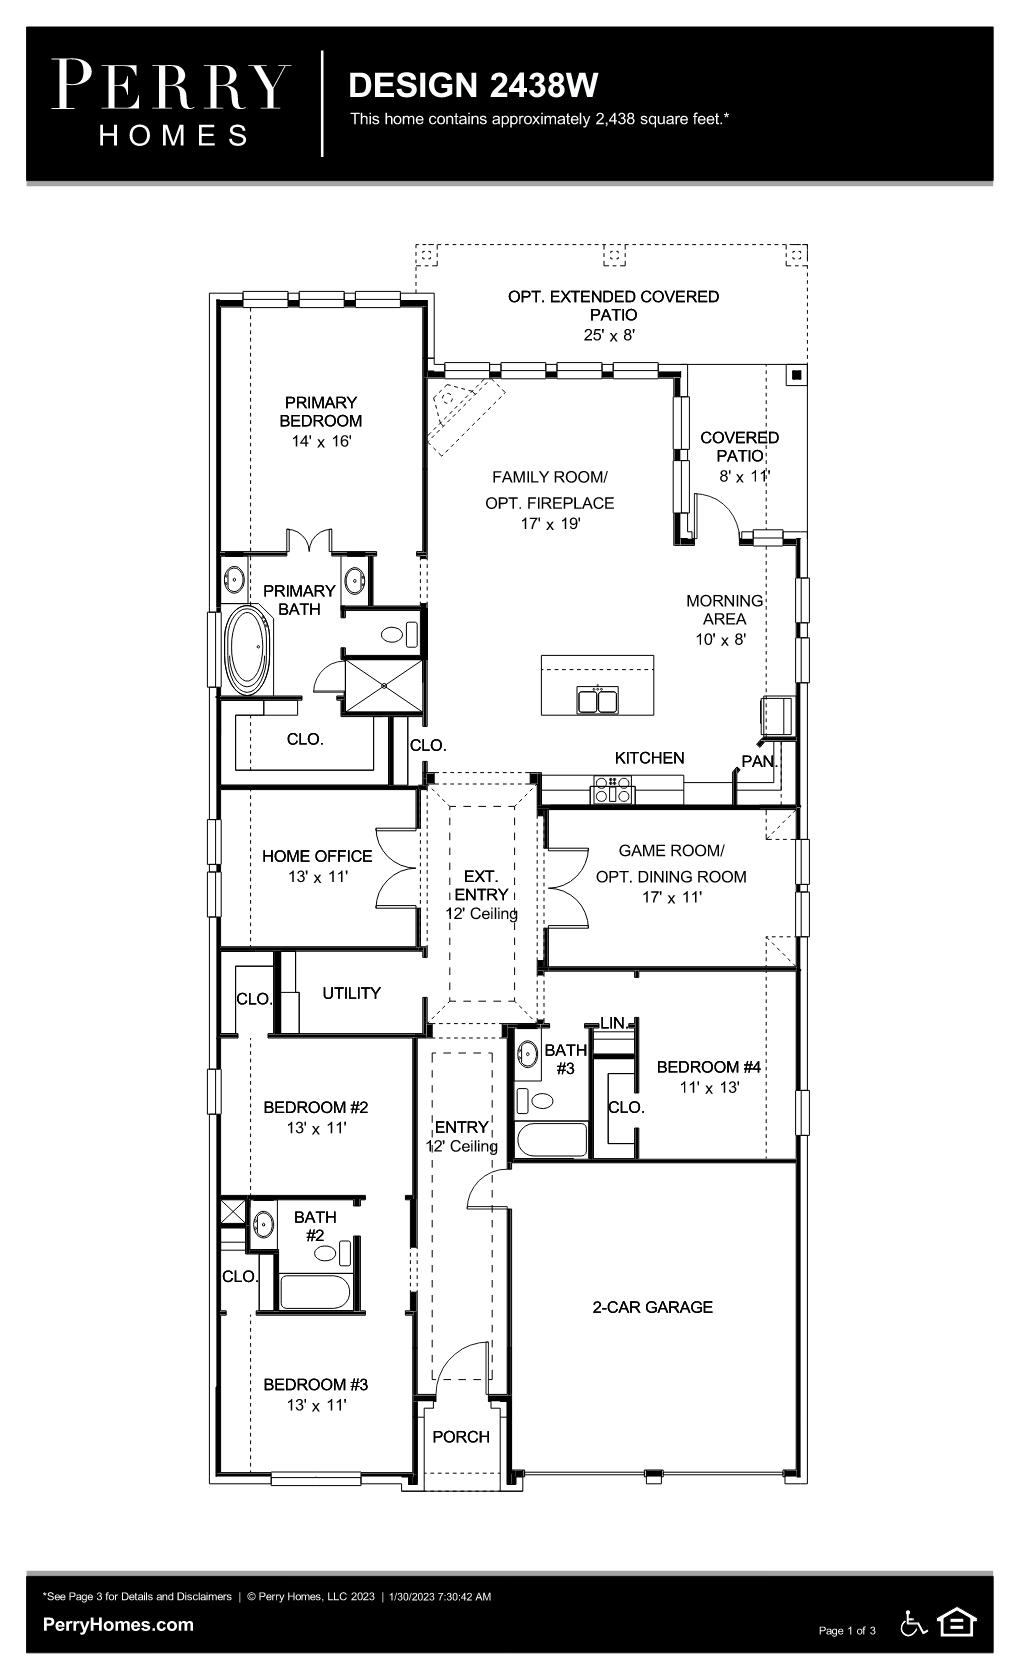 Floor Plan for 2438W